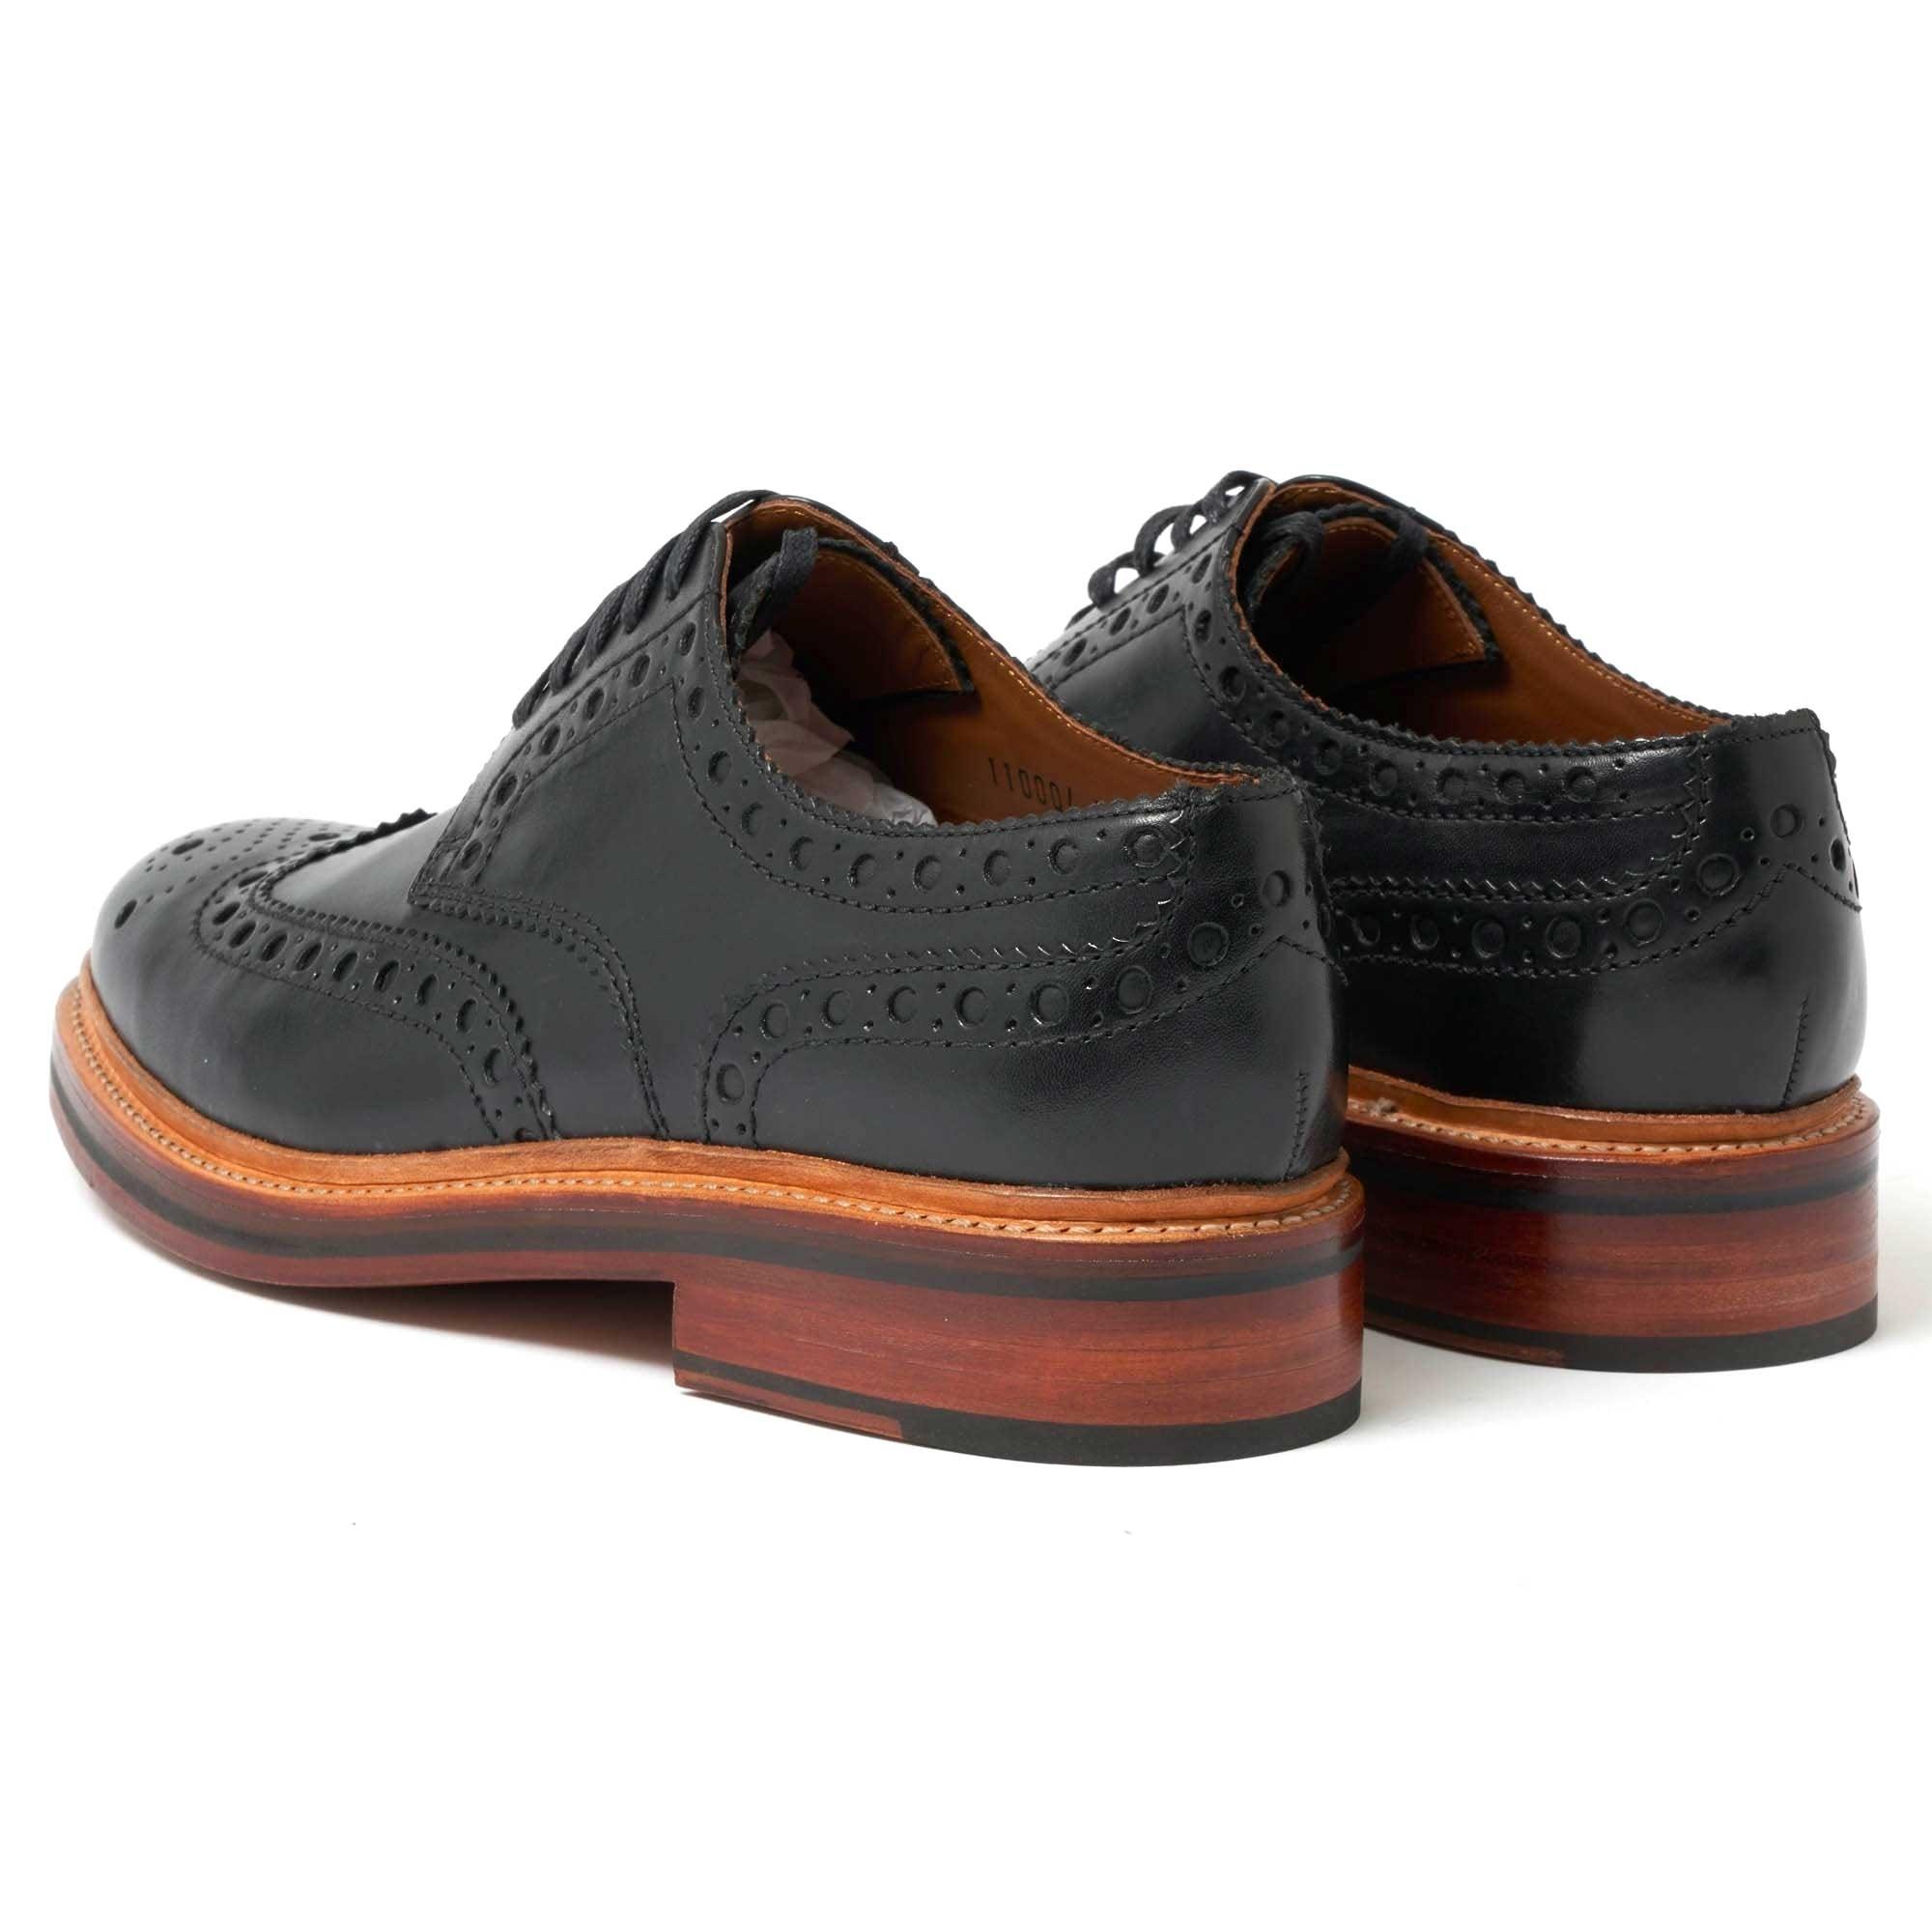 Grenson London   Archie Black Brogue Shoes